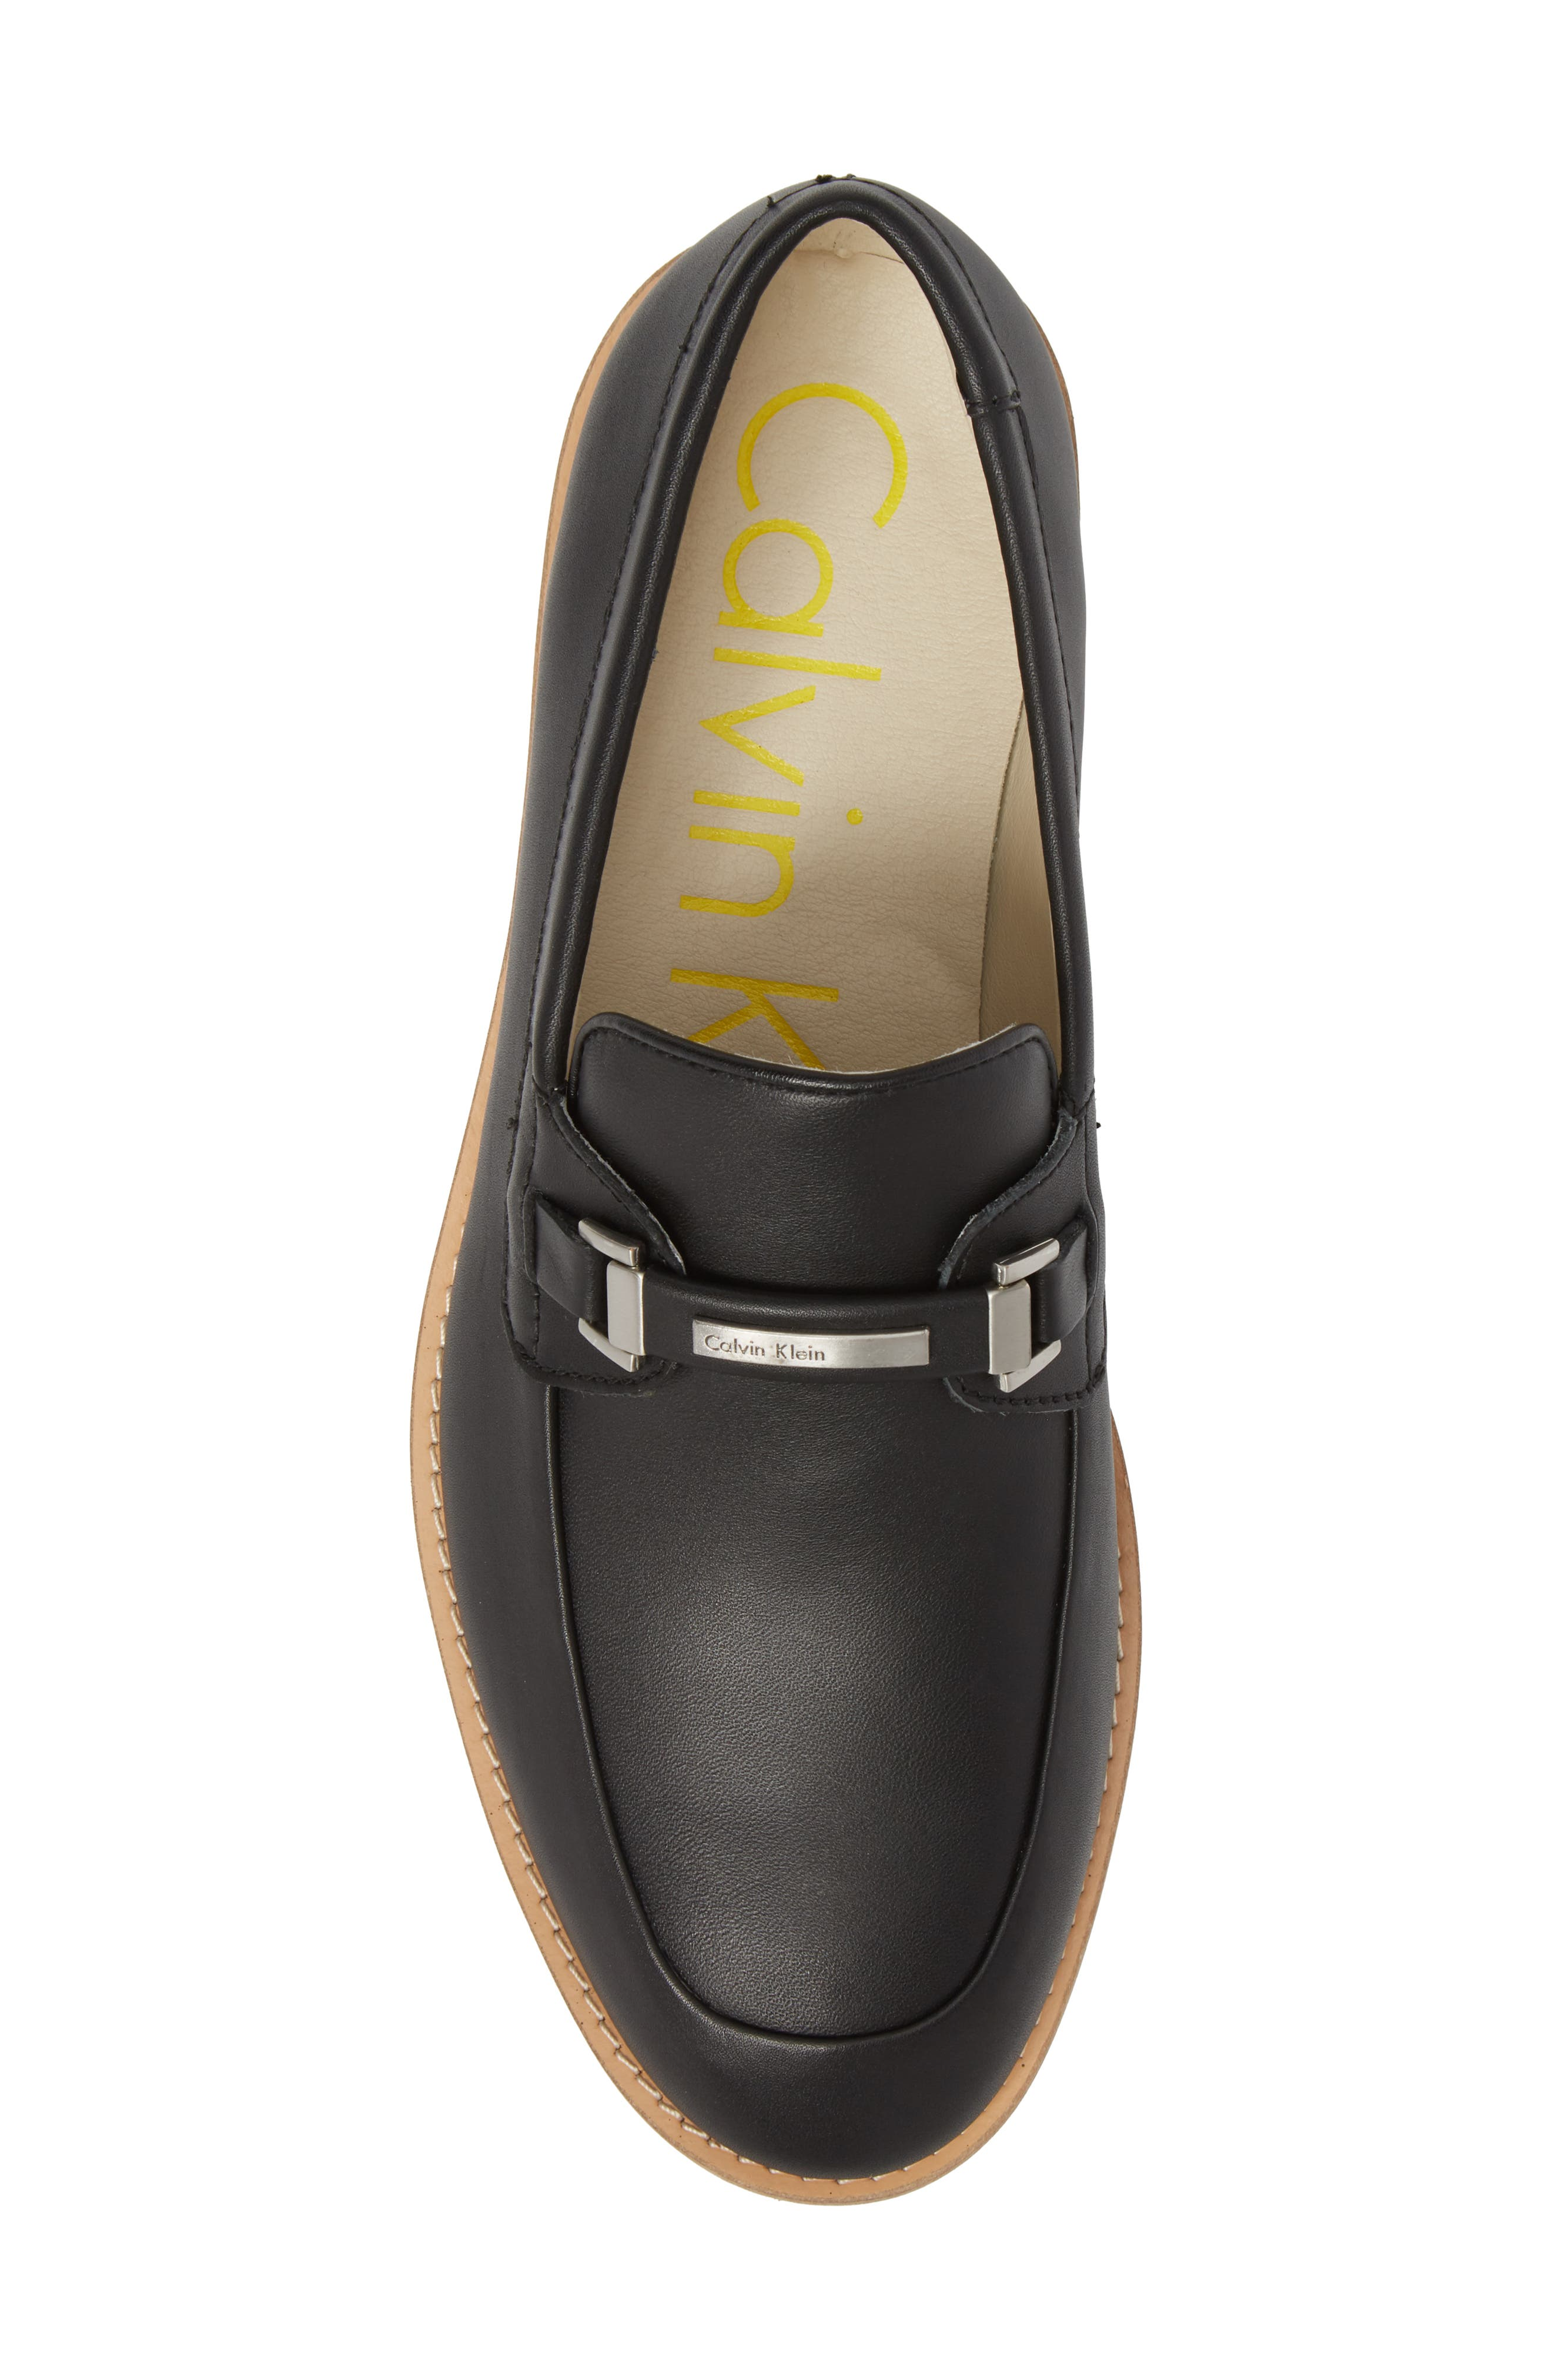 Adler Bit Loafer,                             Alternate thumbnail 5, color,                             Black Leather